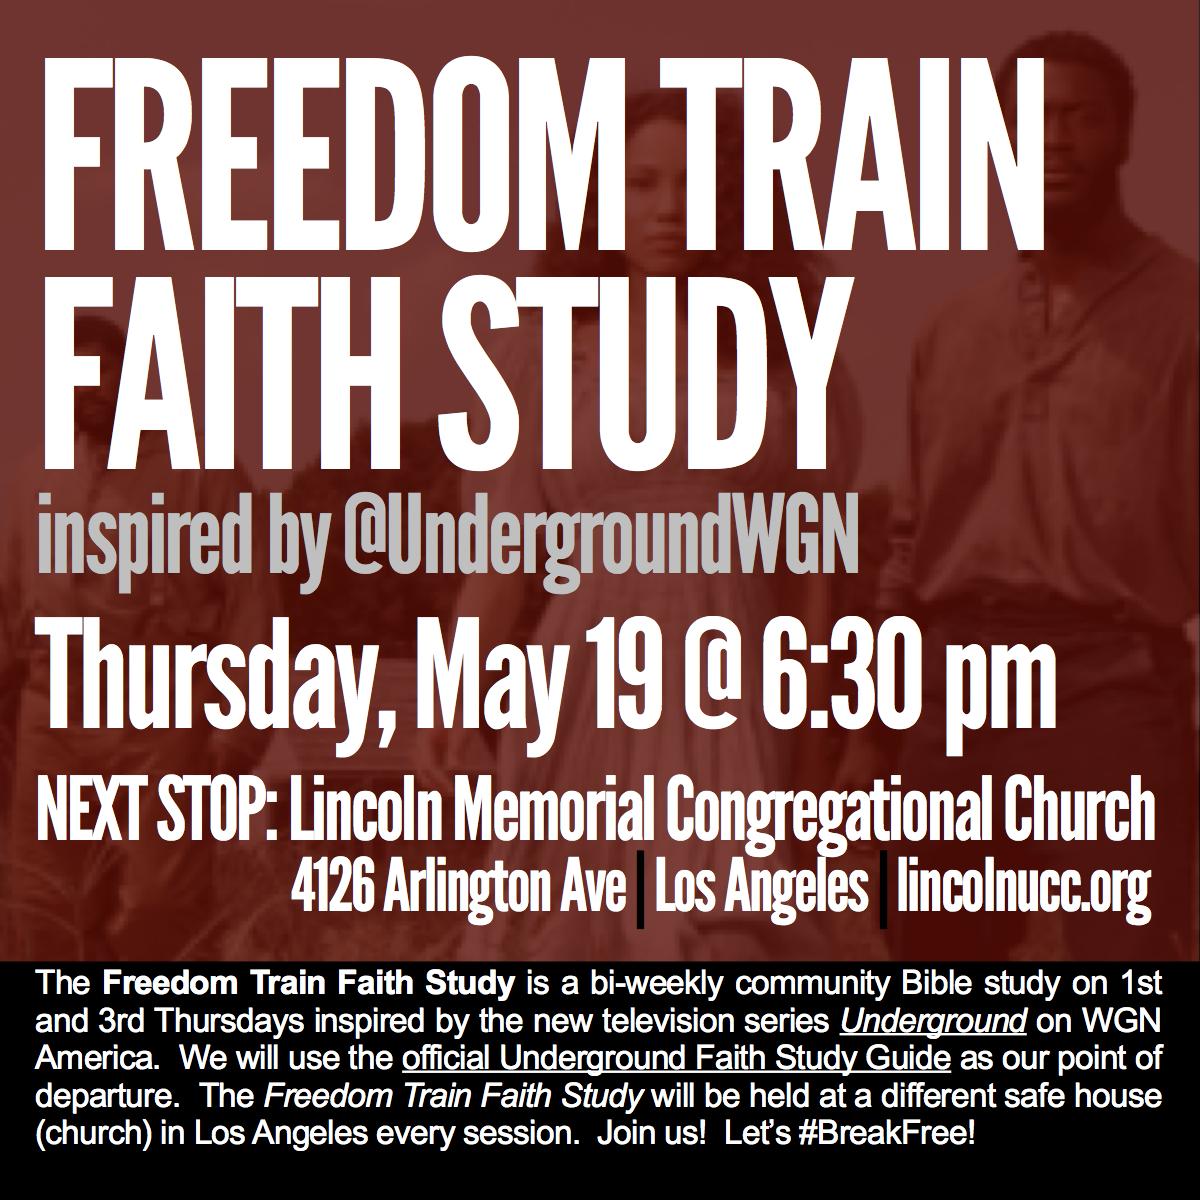 Freedom Train social media ad - Lincoln